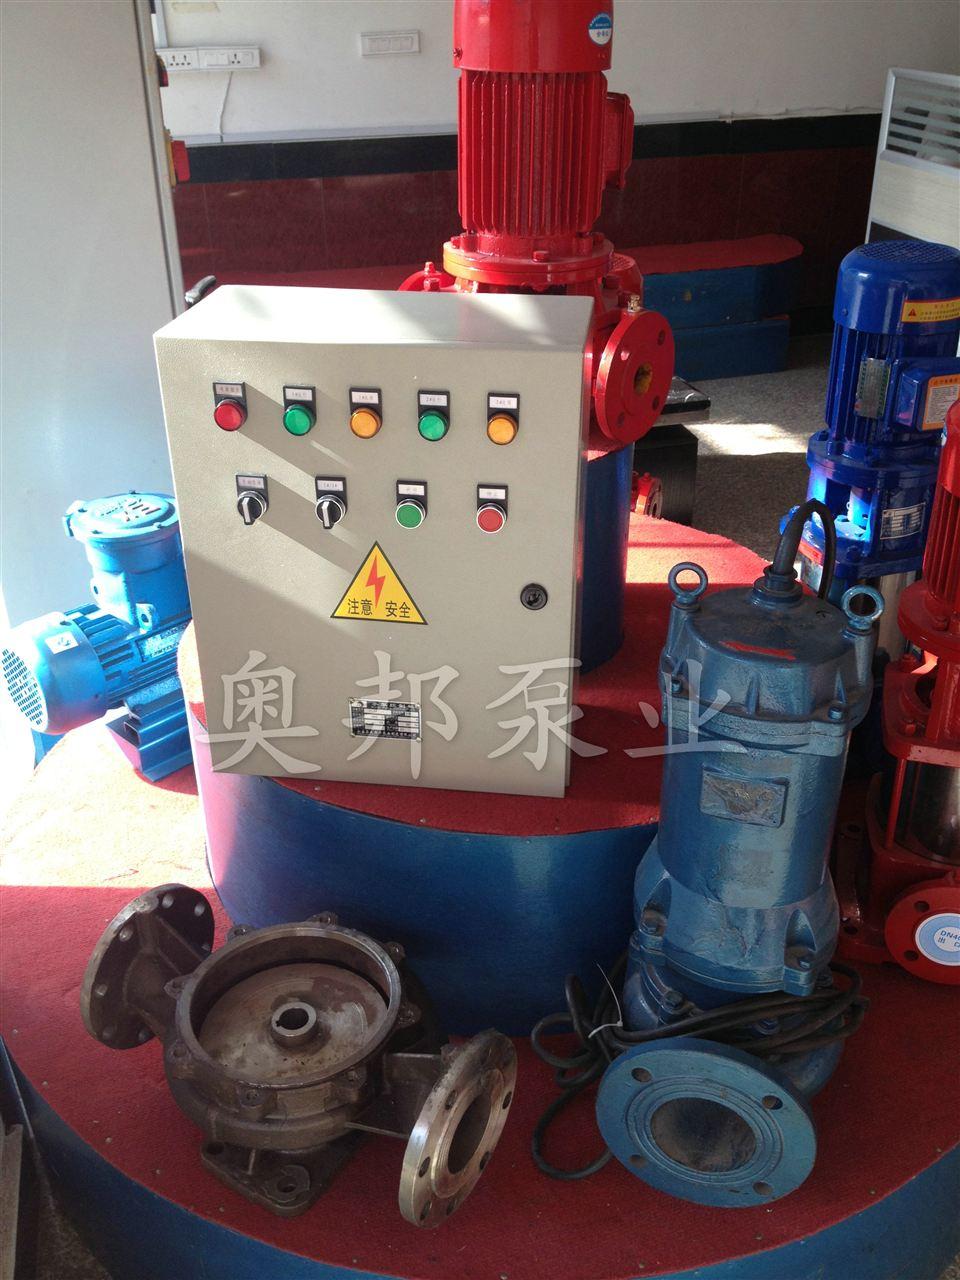 dxk系列水泵控制柜,消防控制柜